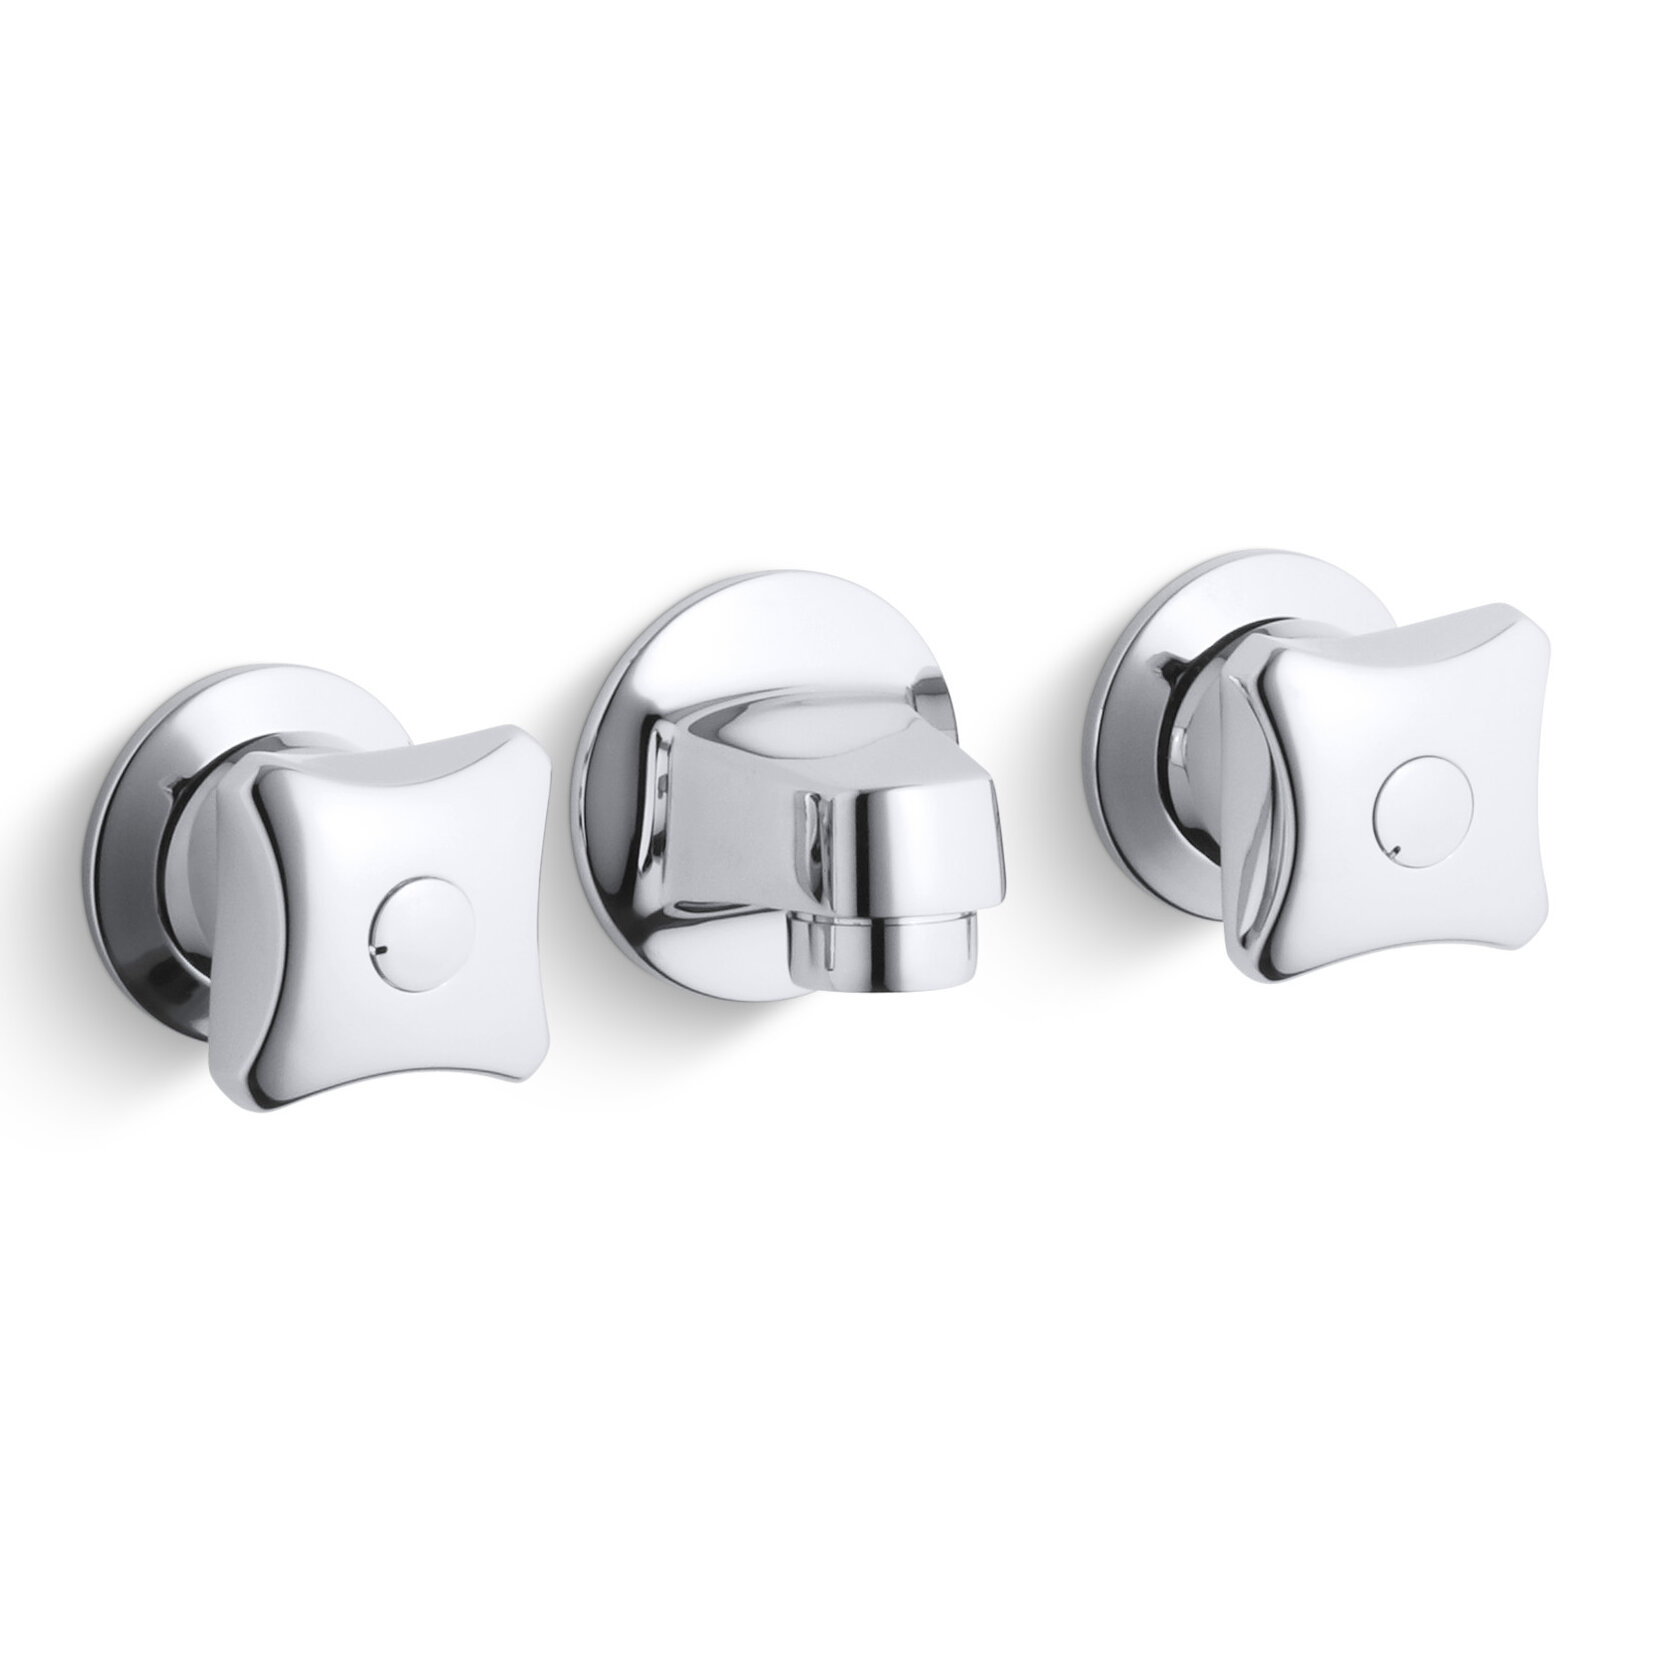 Kohler Triton Shelf Back Commercial Bathroom Sink Faucet With Grid Drain And Standard Handles Wayfair